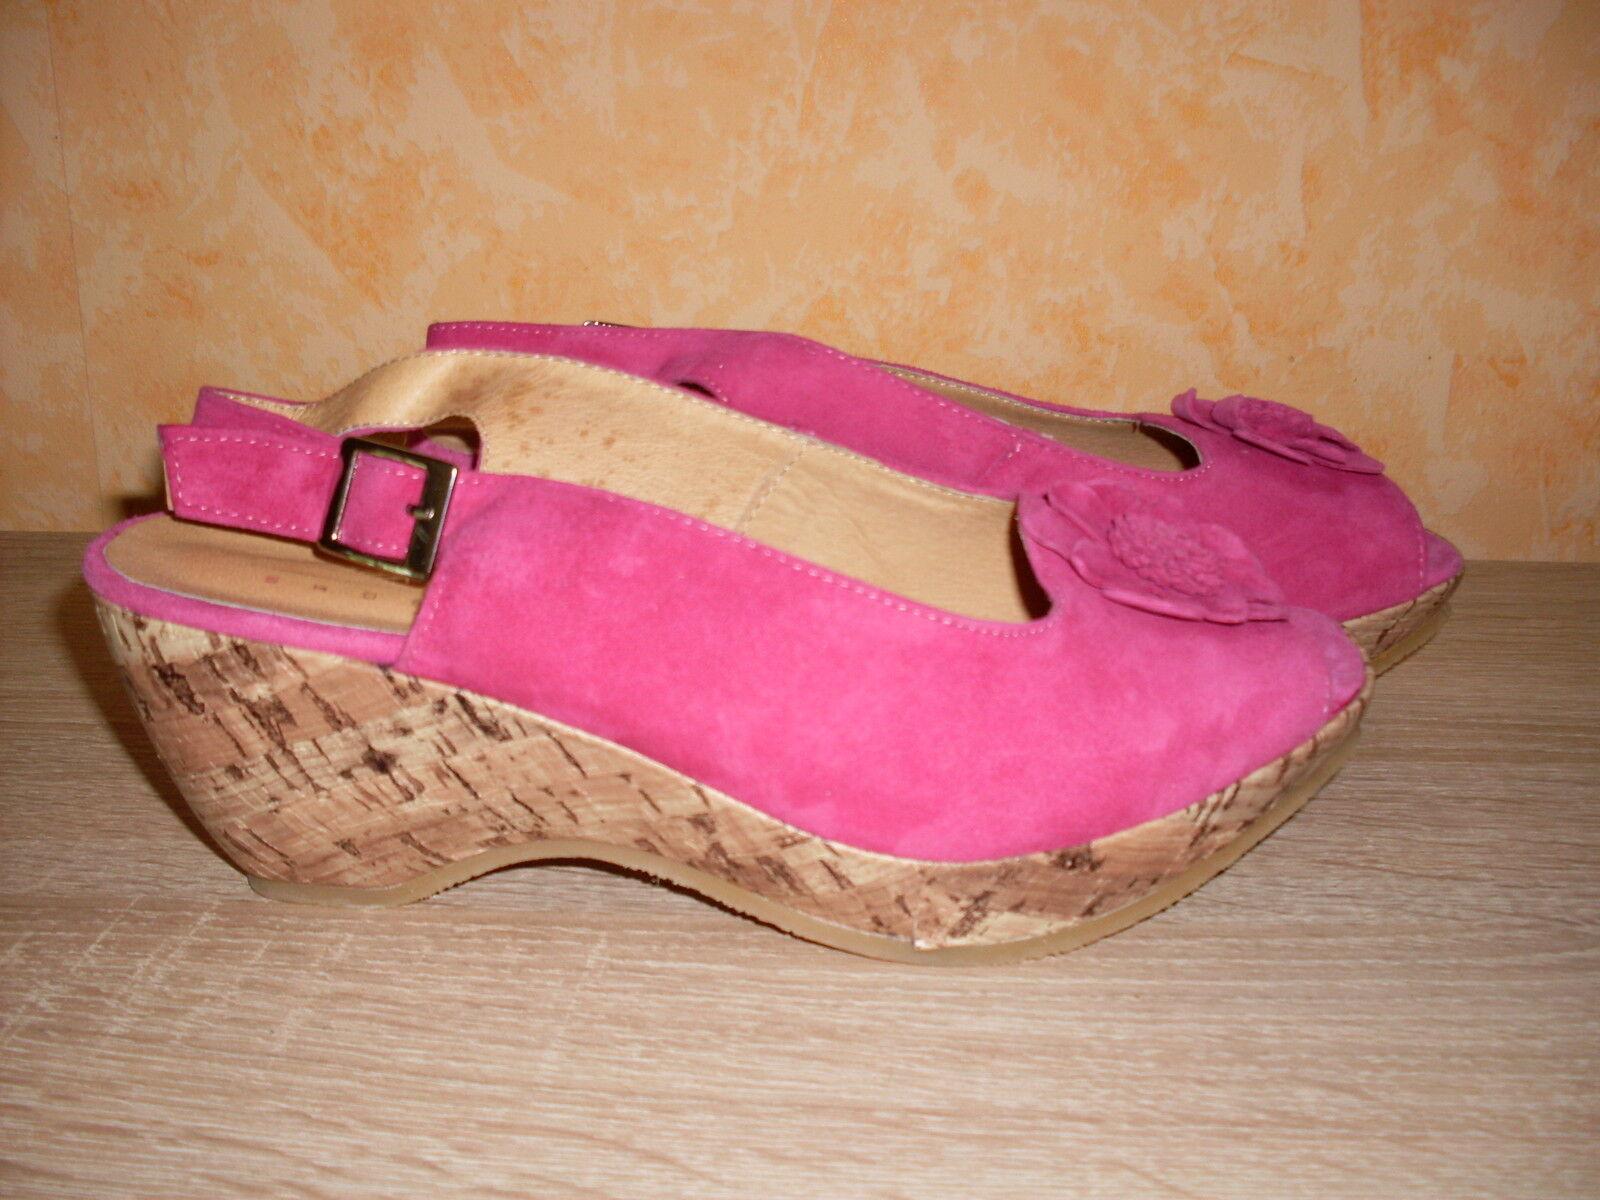 Andrea Conti super süsse KeilSandaleeette NEU Gr. 38 in pink & butterweichem Leder